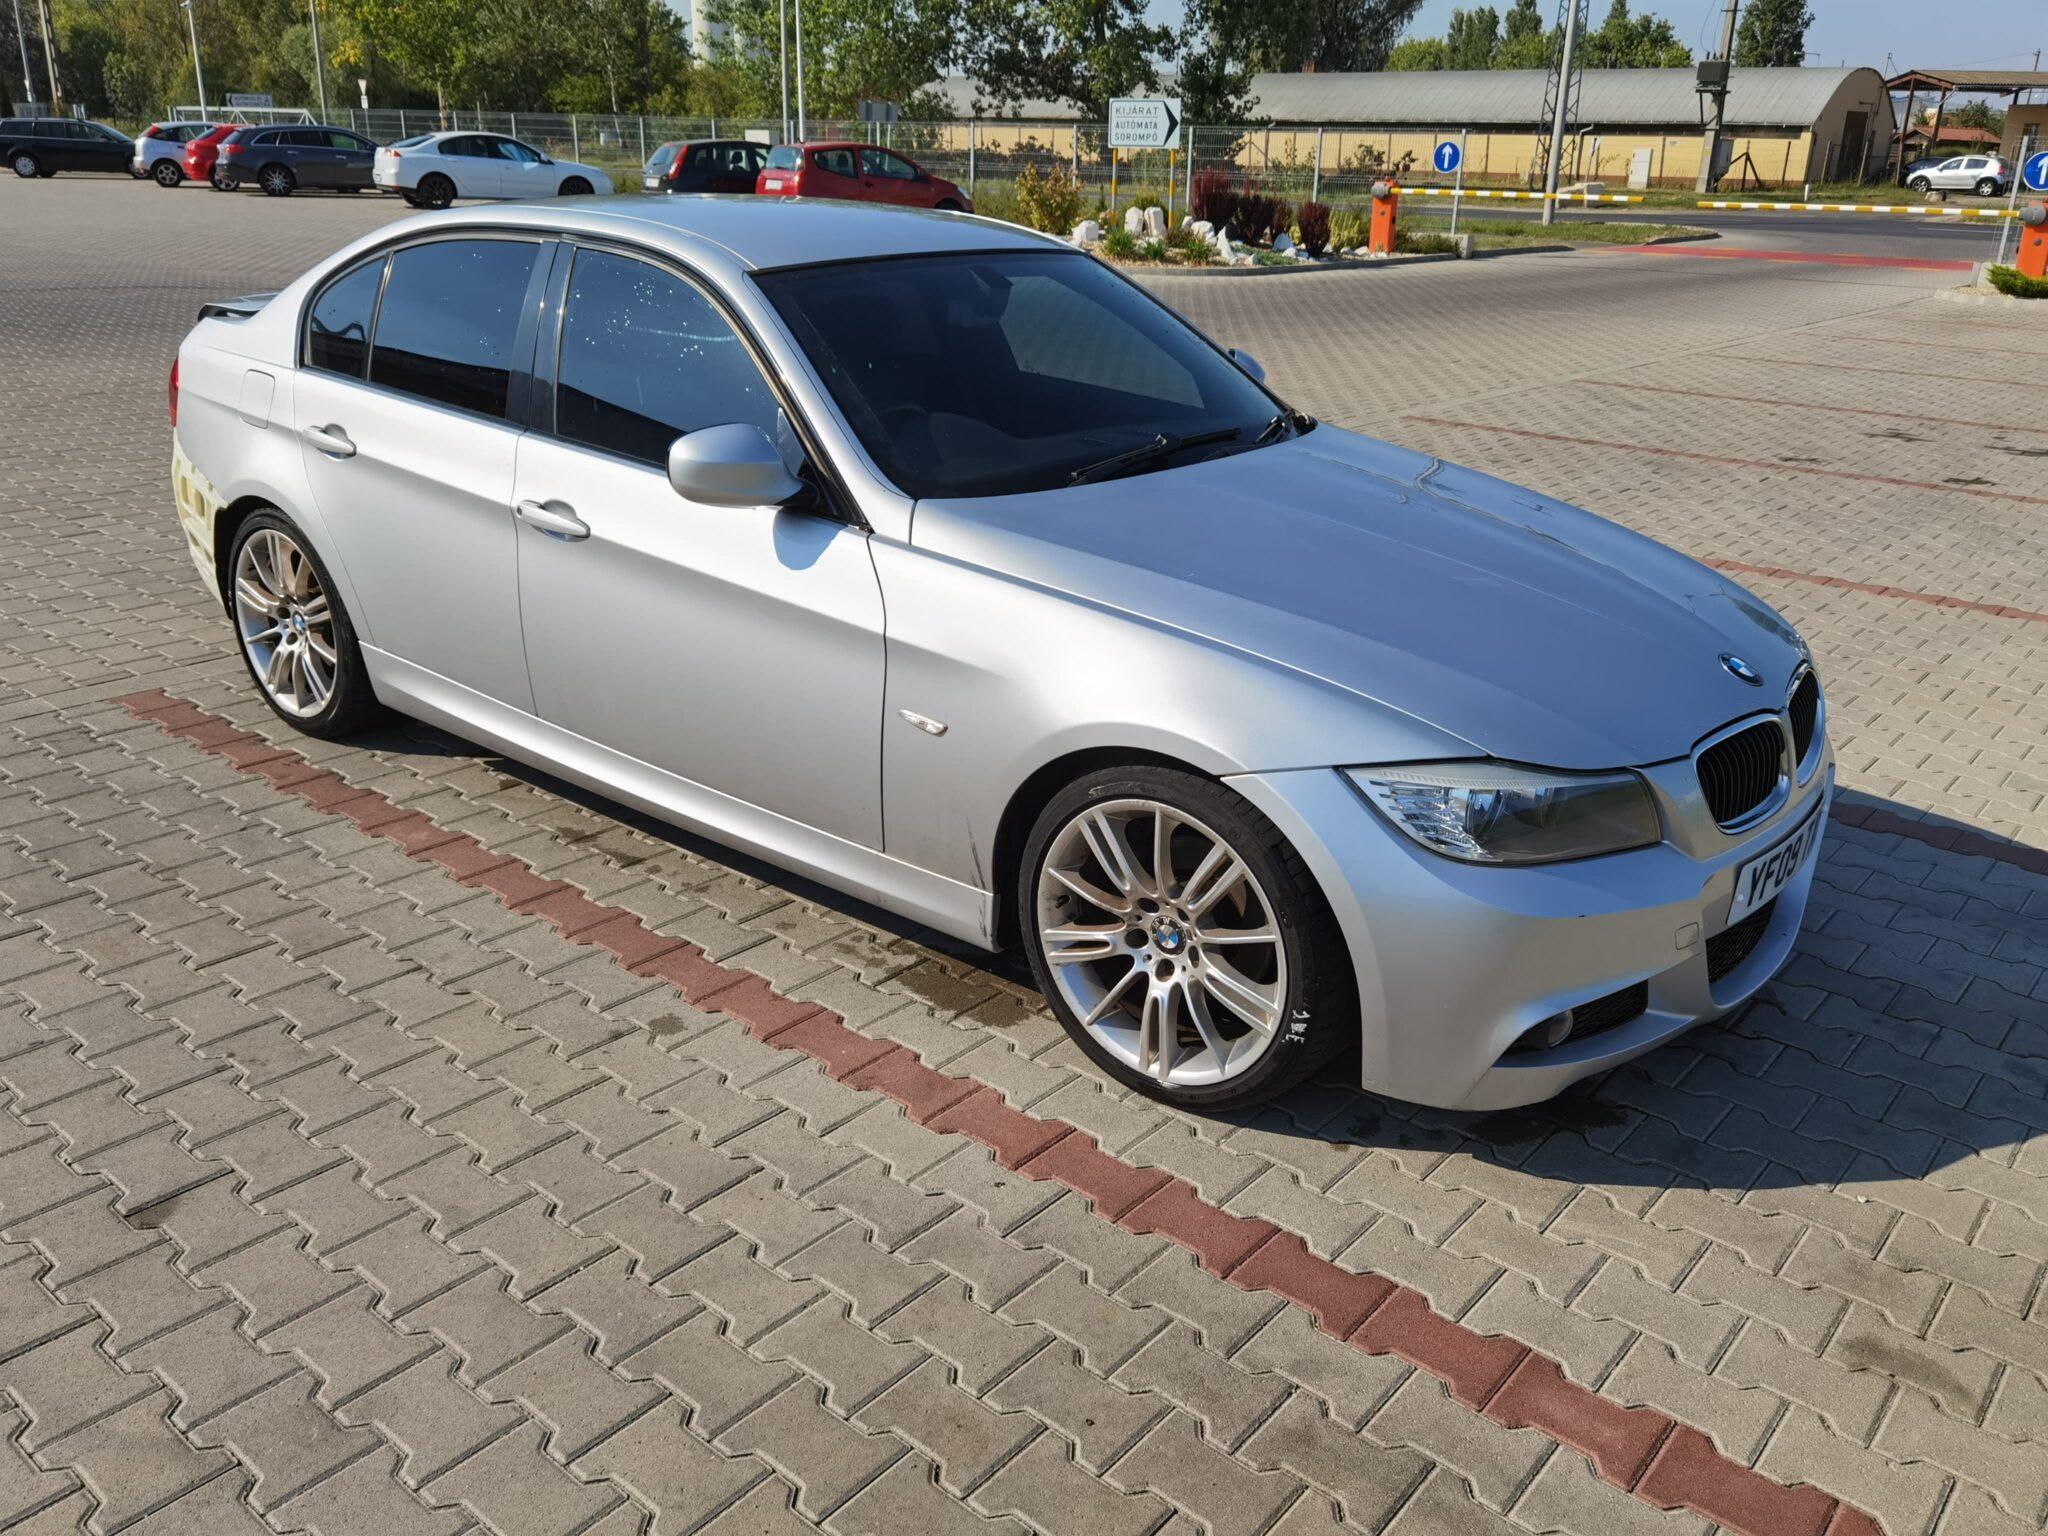 BMW E90 lci 318d Carbon Car Center Békéscsaba-10